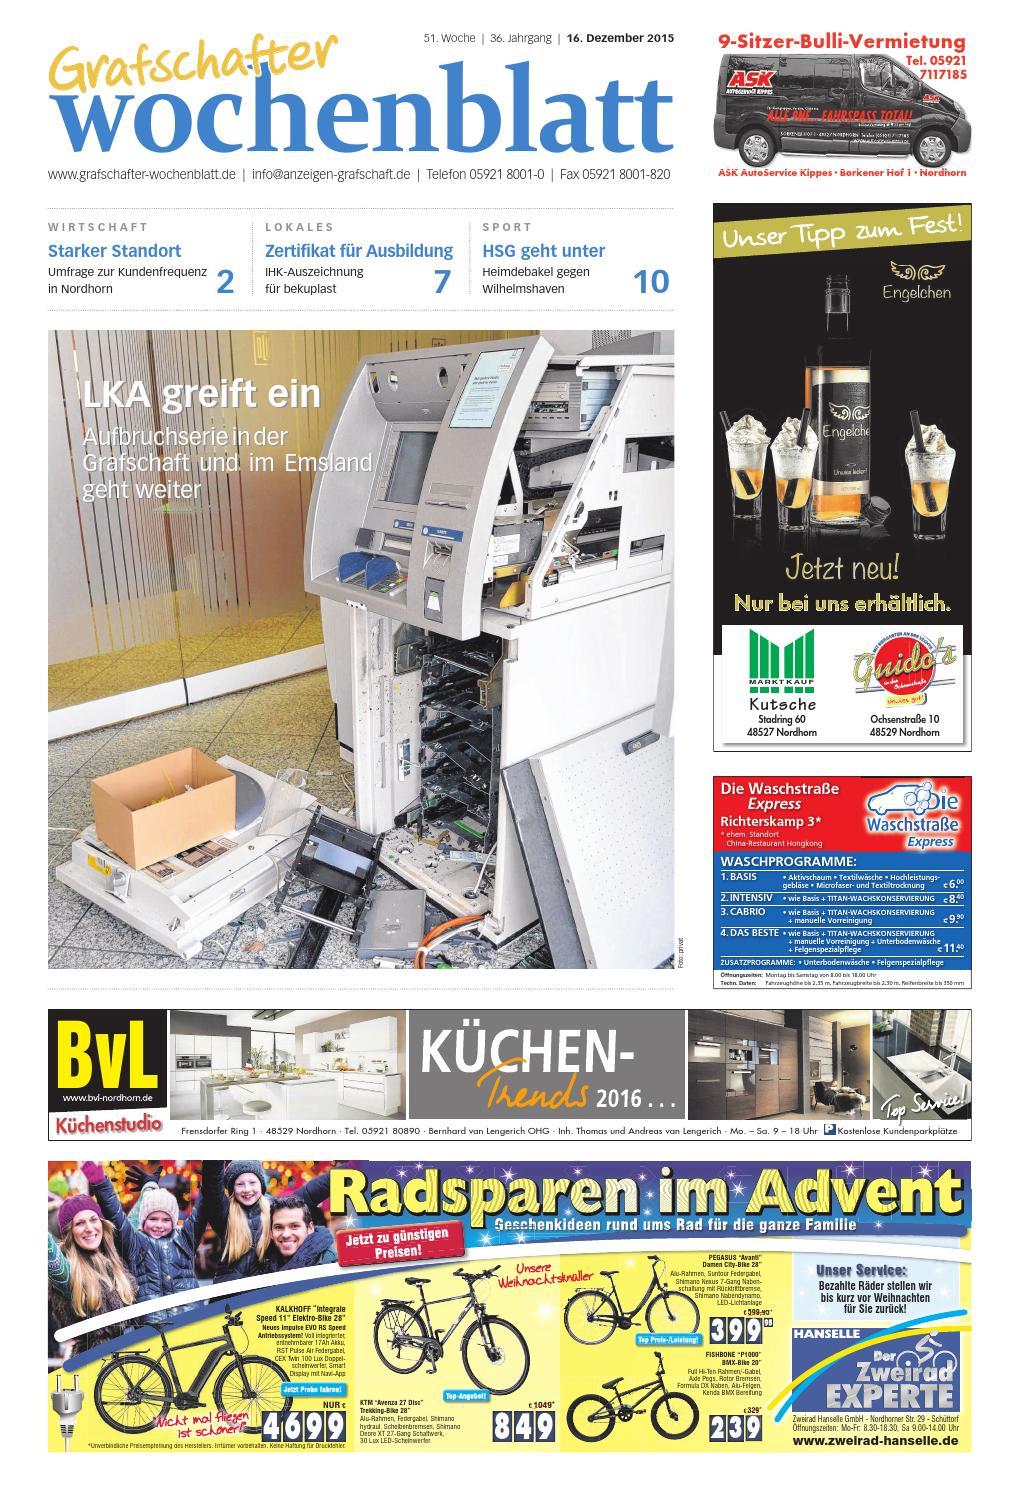 Grafschafter Wochenblatt_16.12.2015 by SonntagsZeitung - issuu